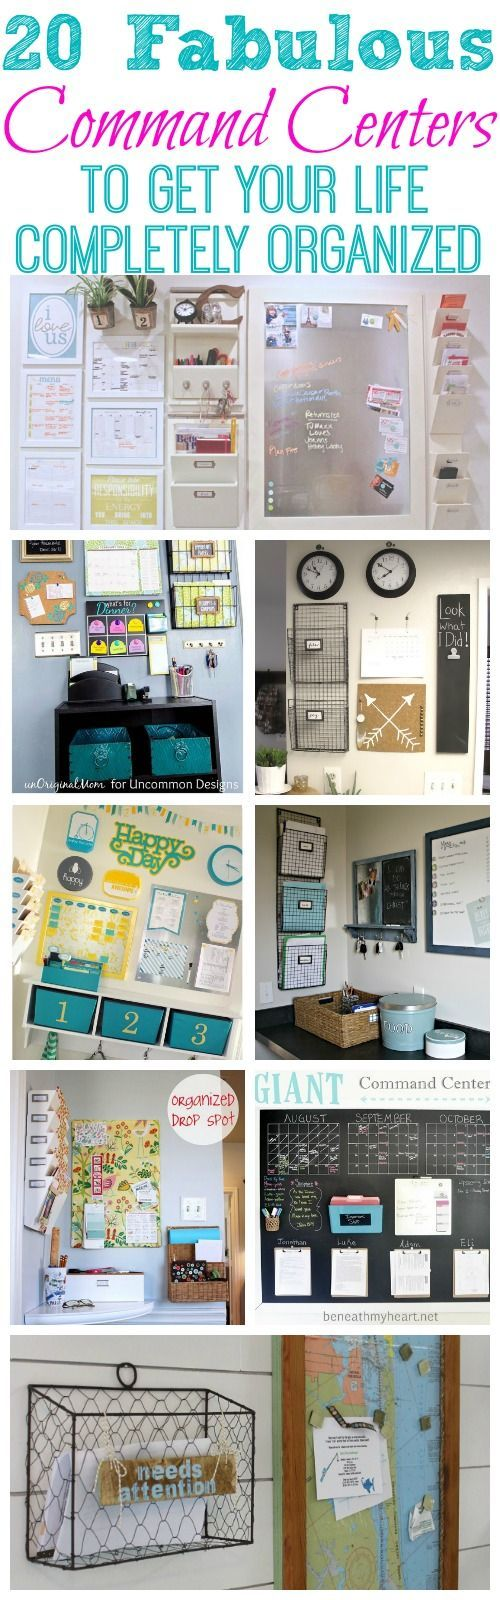 523 Best Home Organizing Ideas Images On Pinterest Organizing